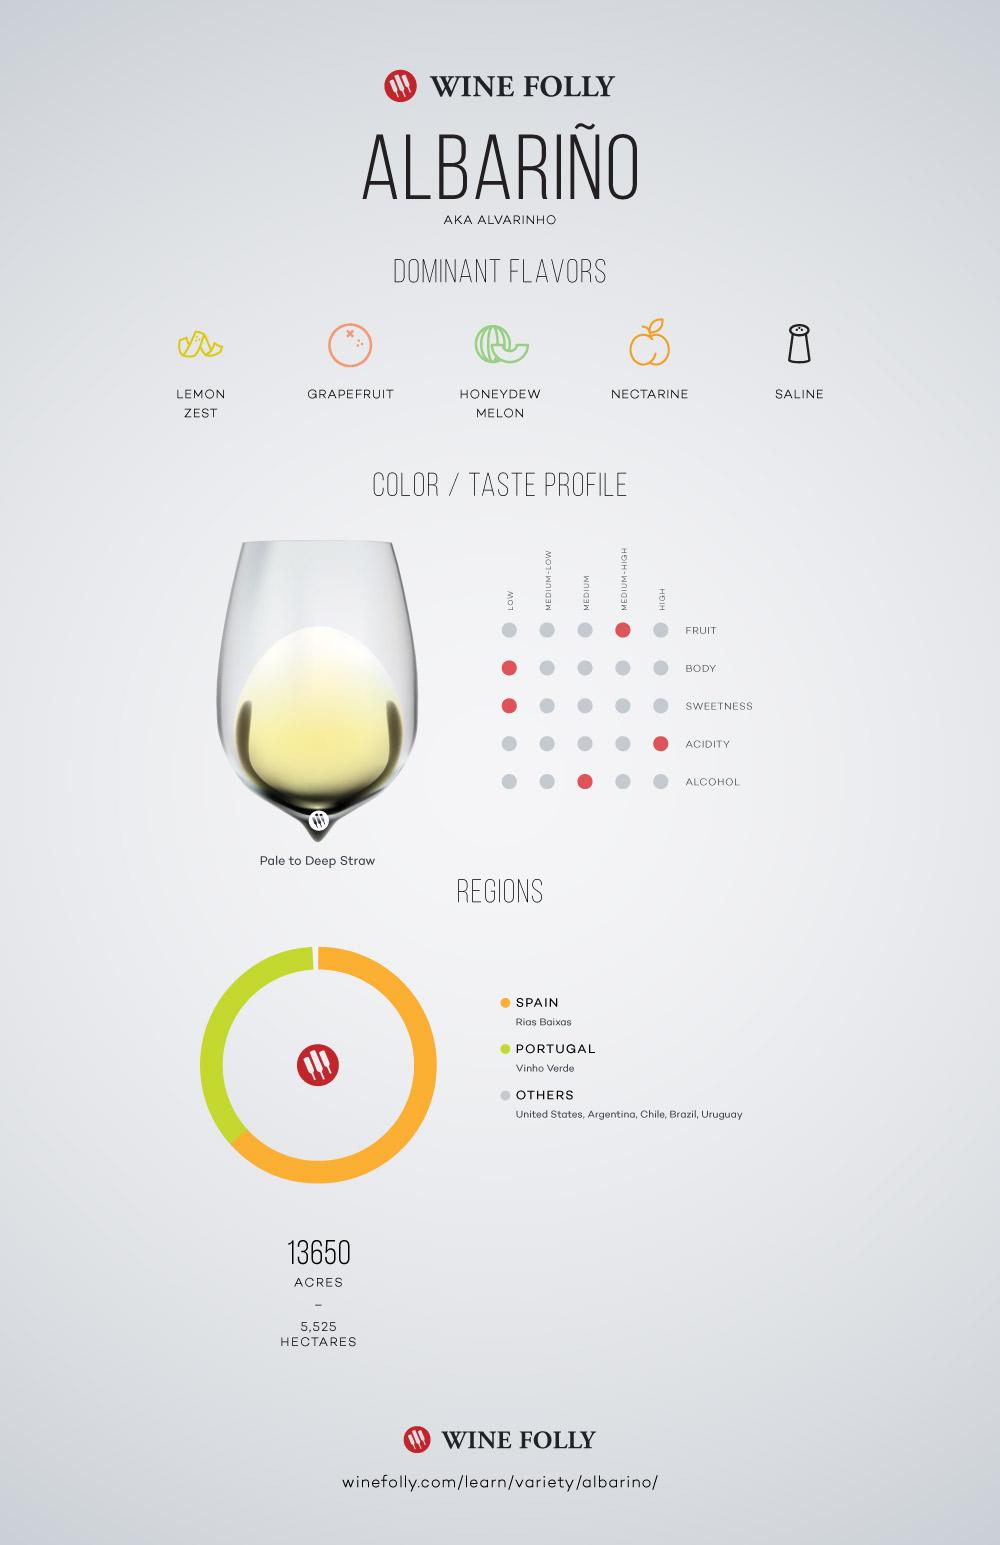 Wine Folly albarino.jpg